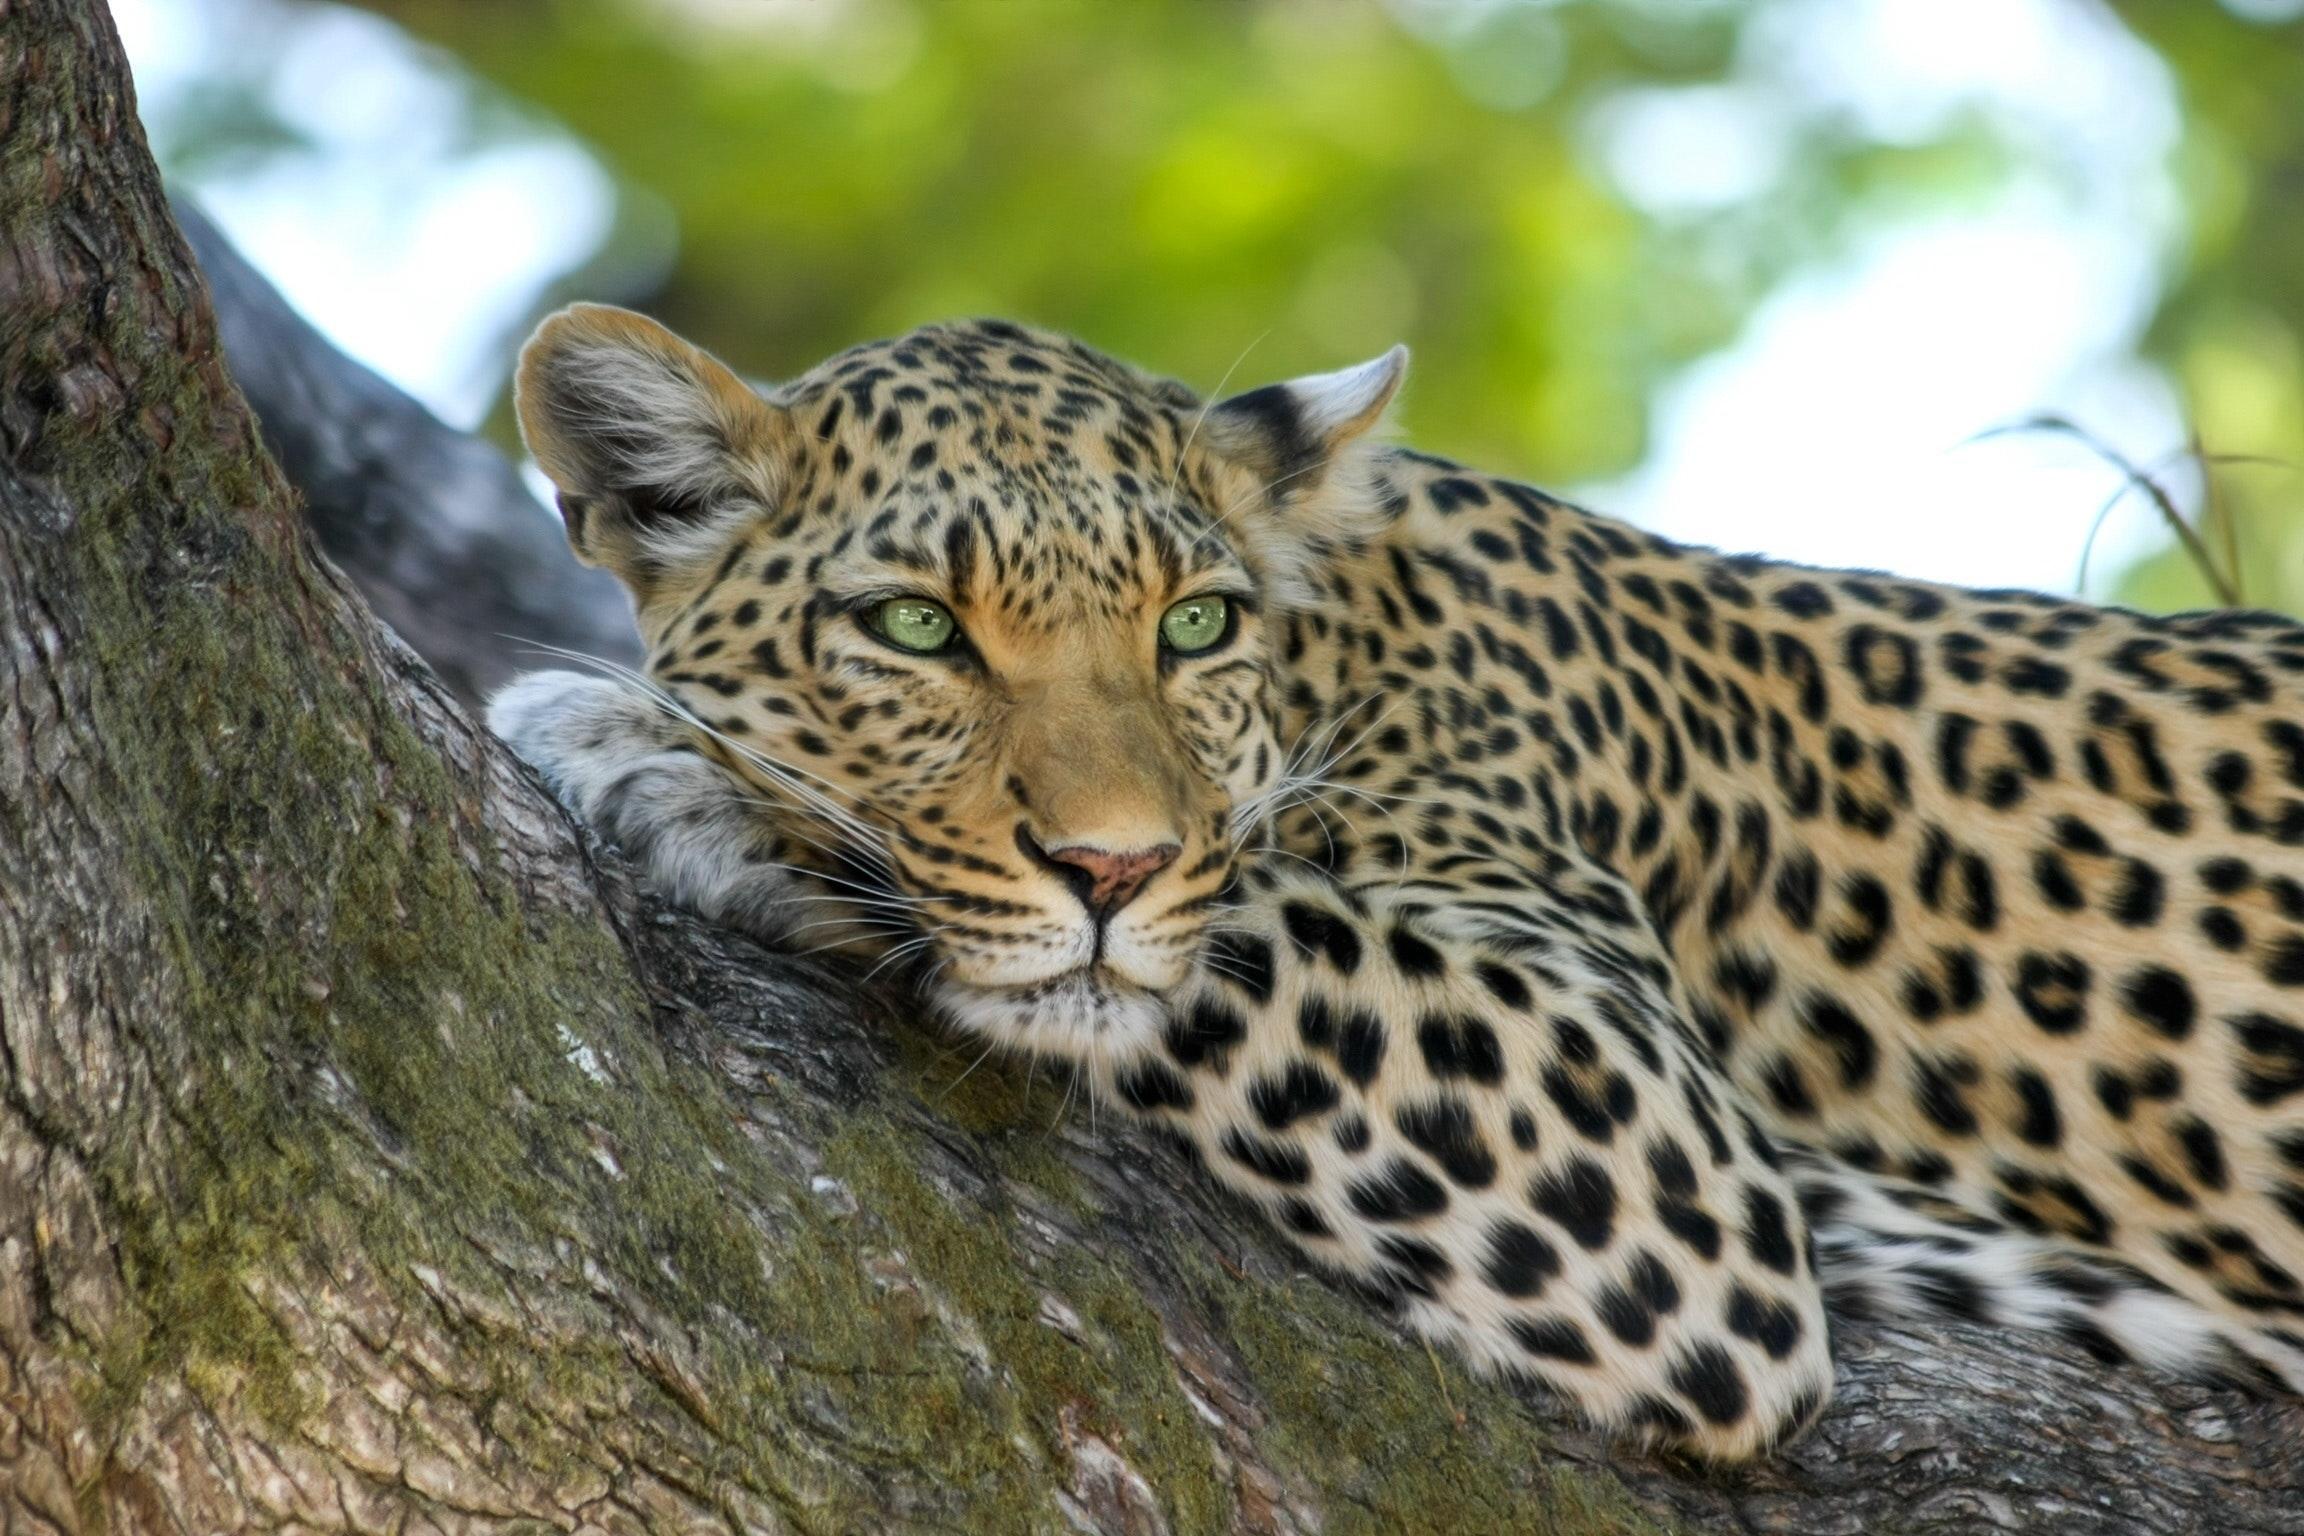 The most Impressive Leopard Photos · Pexels · Free Stock Photos